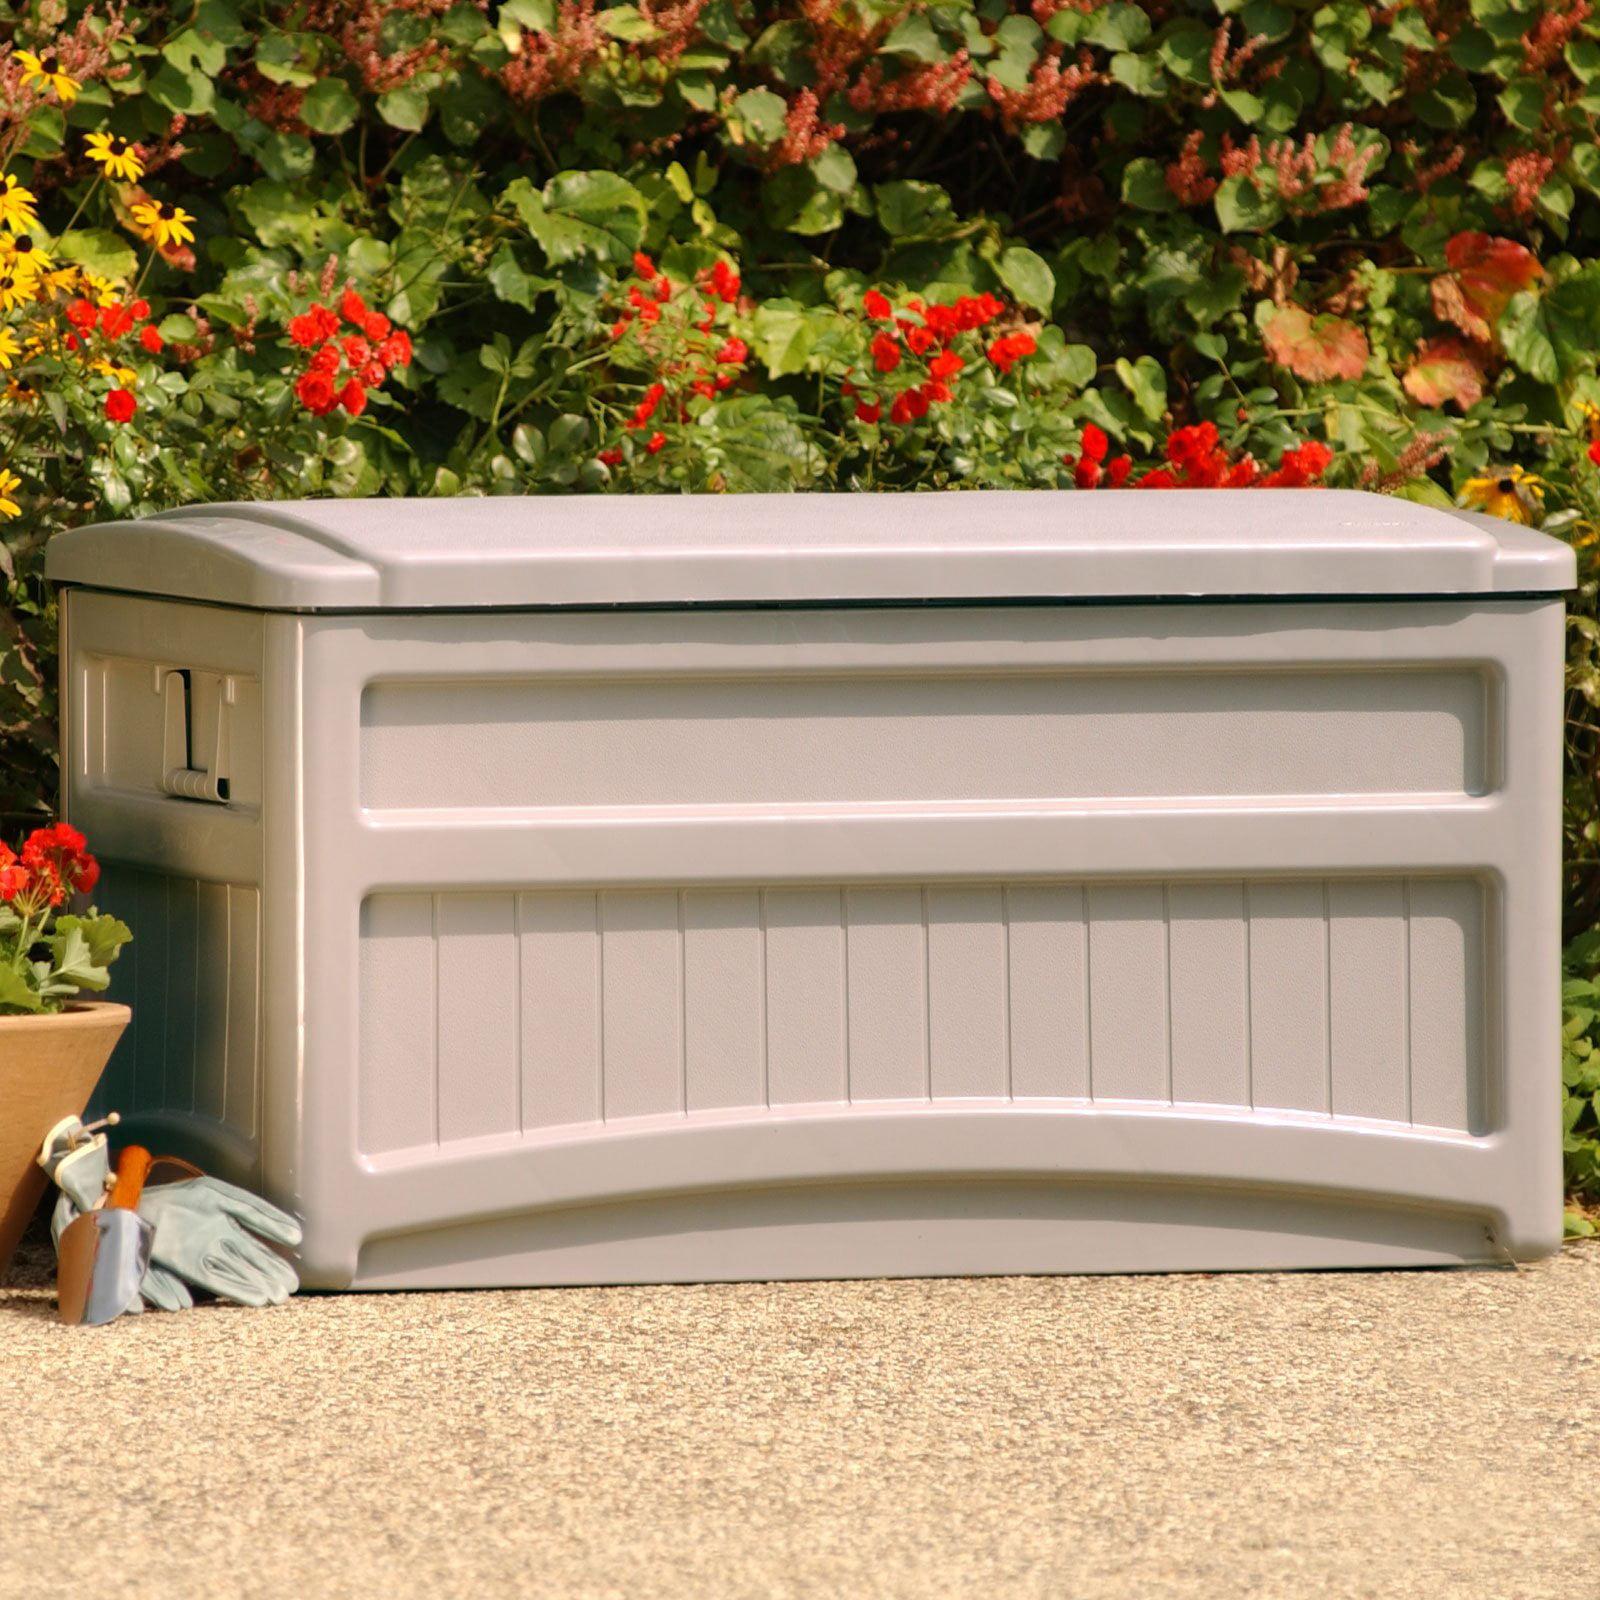 Superieur Suncast Saxon Premium 73 Gallon Light Taupe Resin Deck Box With Wheels  DB7000W   Walmart.com